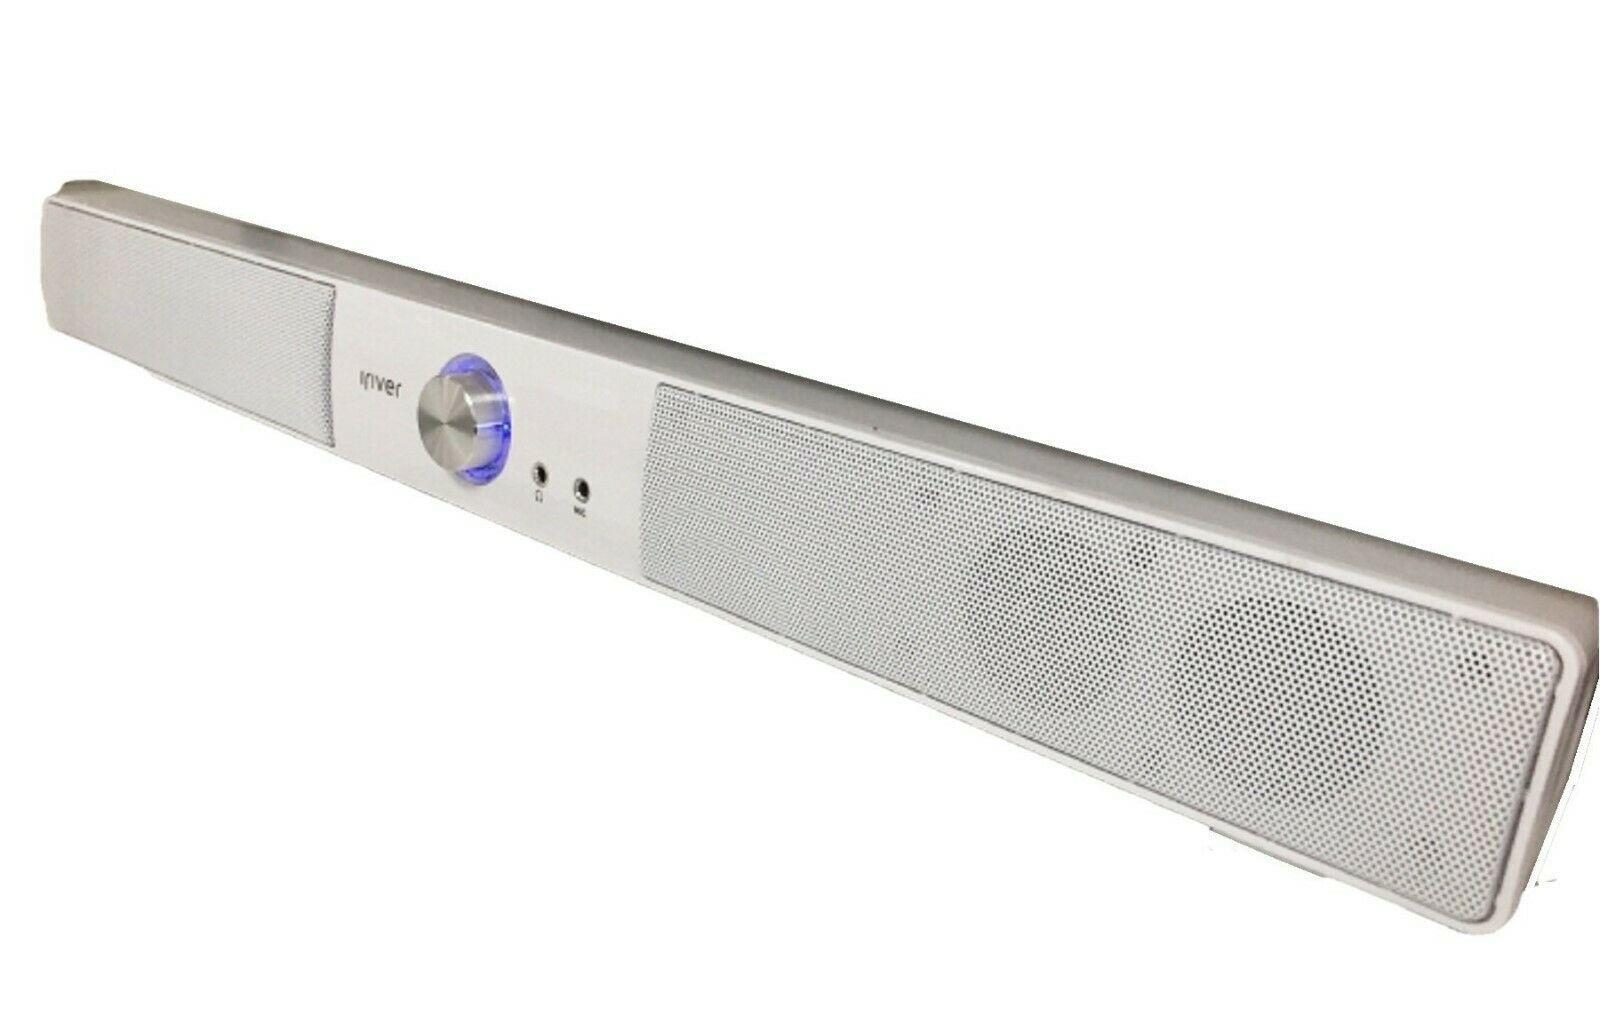 iRiver IBS-400 USB Powered Computer PC Speaker Wired Sound Bar 2Ch (White)